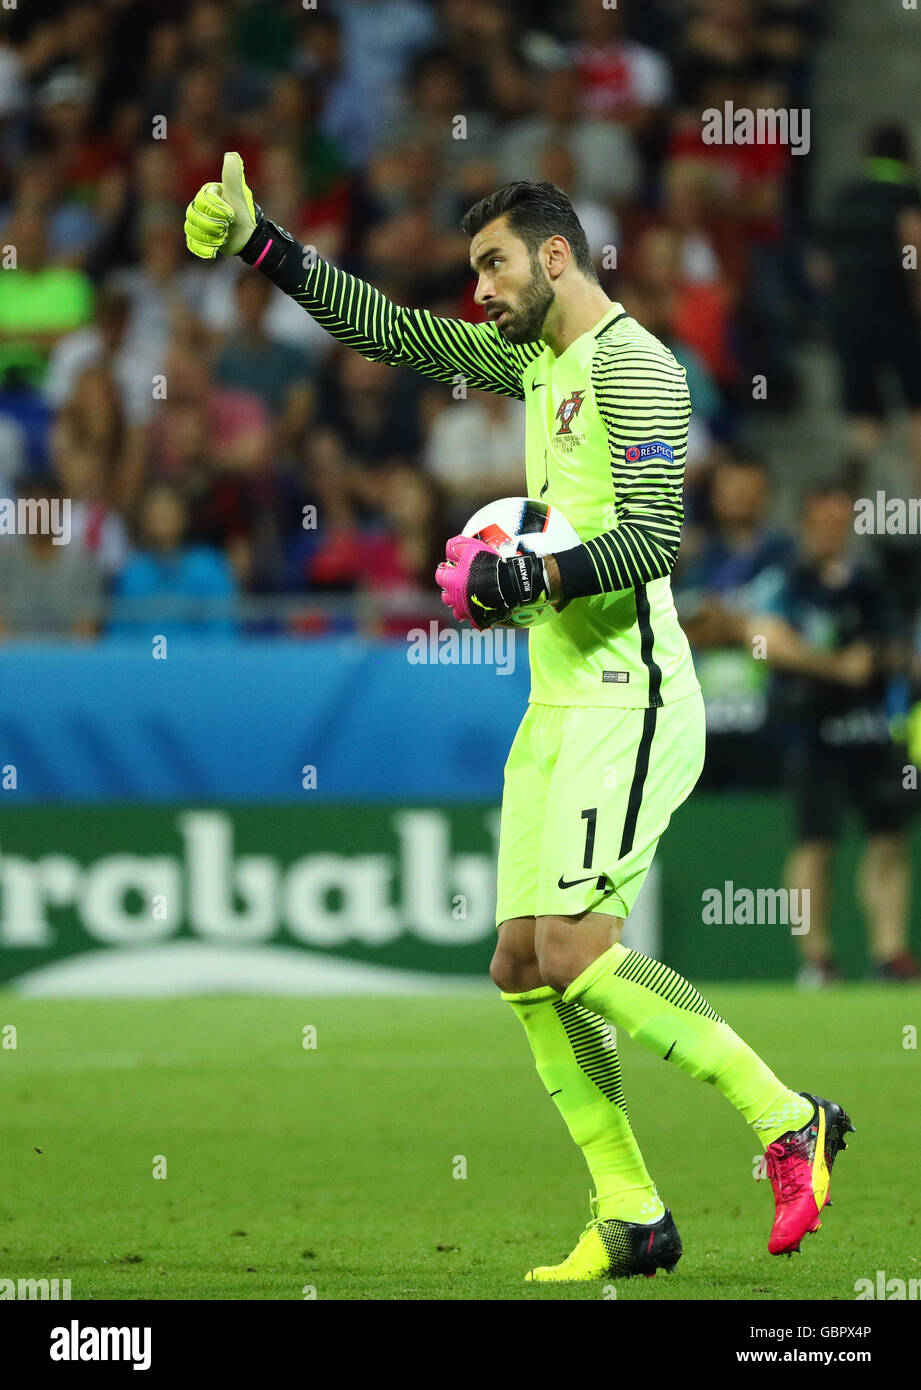 Lyon France 06th July 2016 Goalkeeper Rui Patricio of Portugal